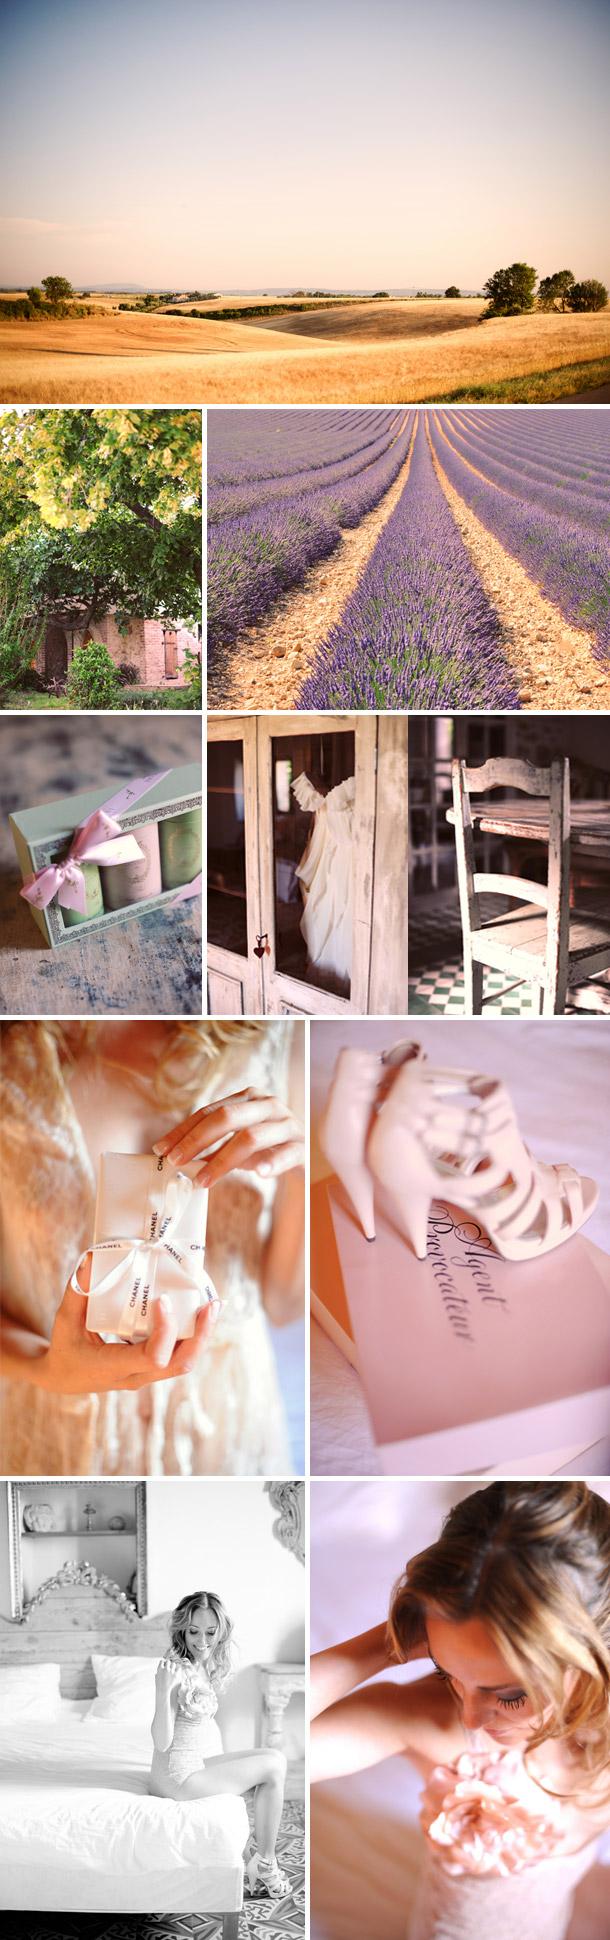 Verlobung im Lavendelfeld bei Andrea und Markus Photography